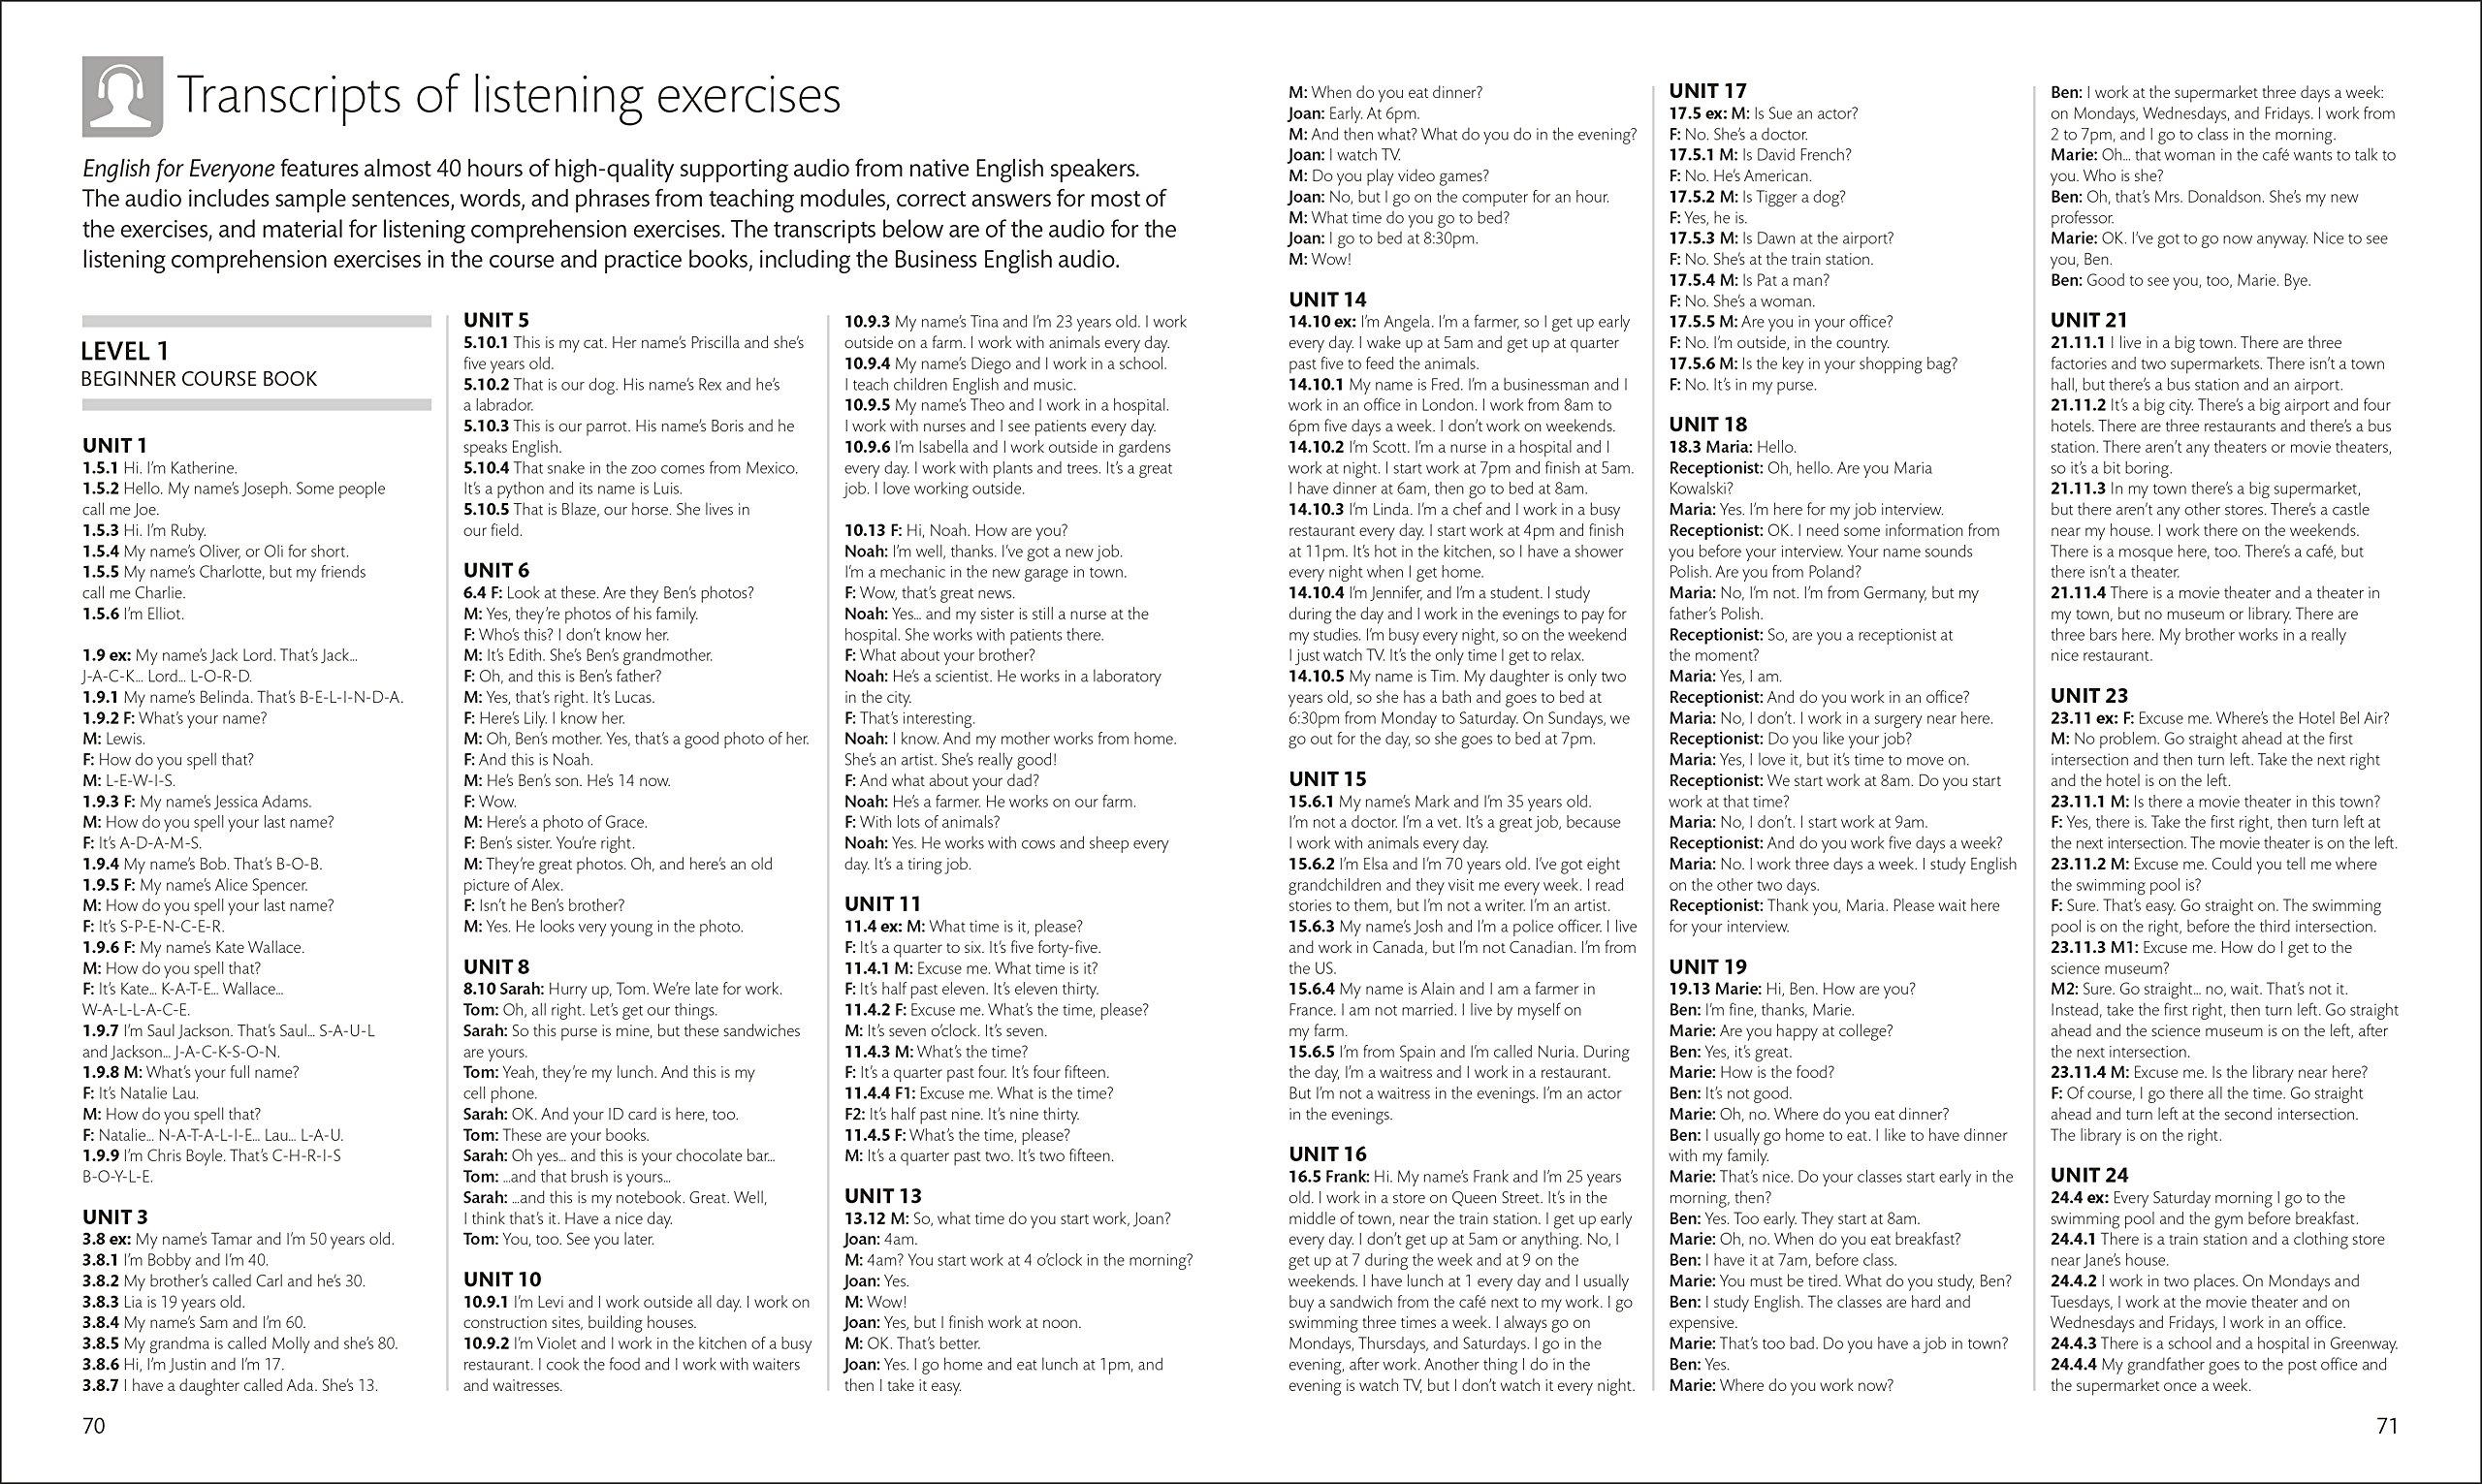 Amazon.com: English for Everyone Teacher's Guide (9781465473899): DK: Books